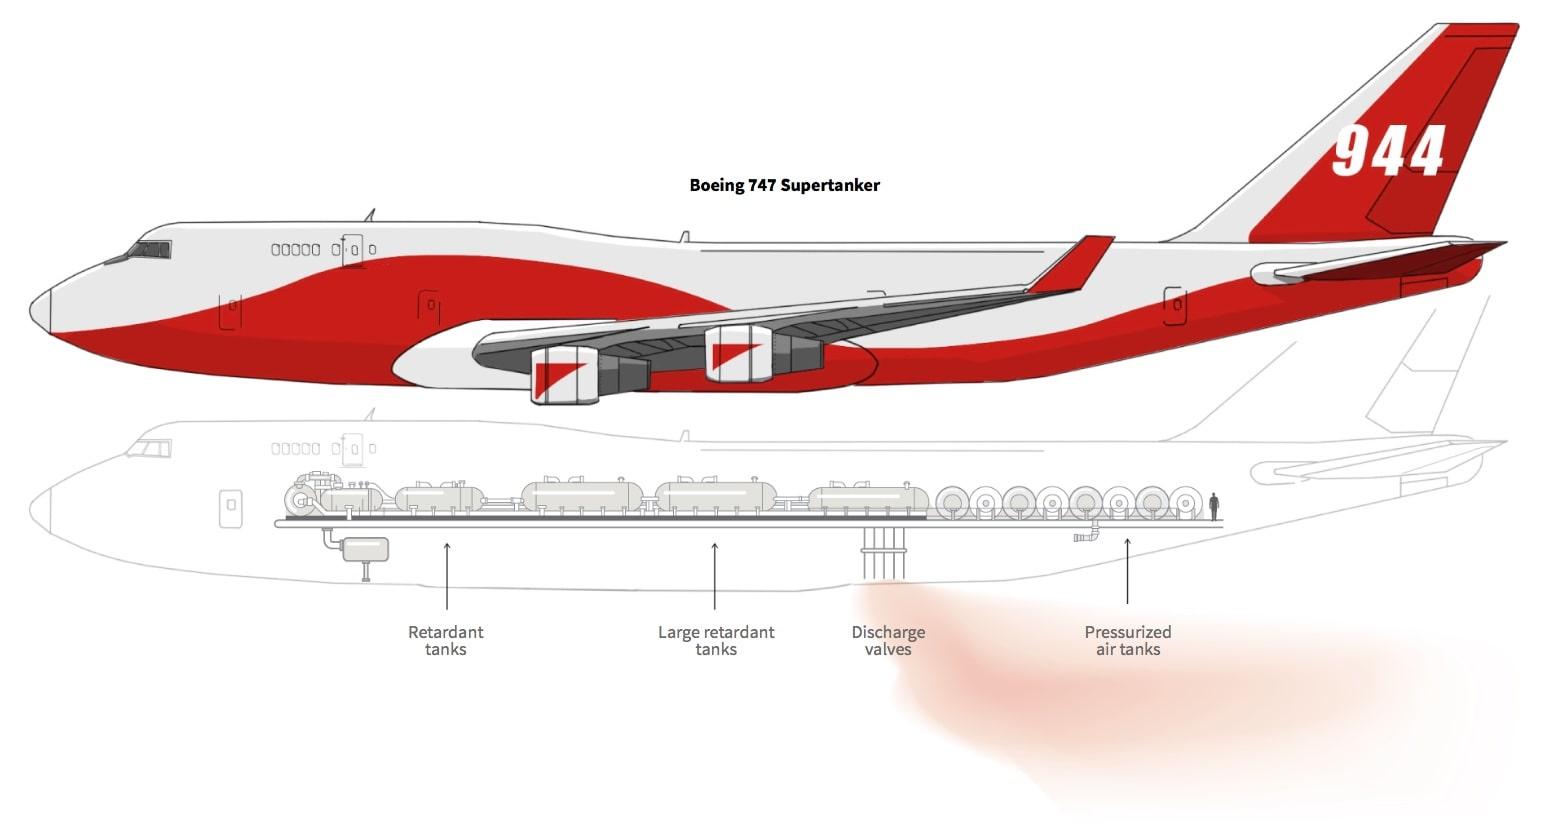 Boeing Supertanker